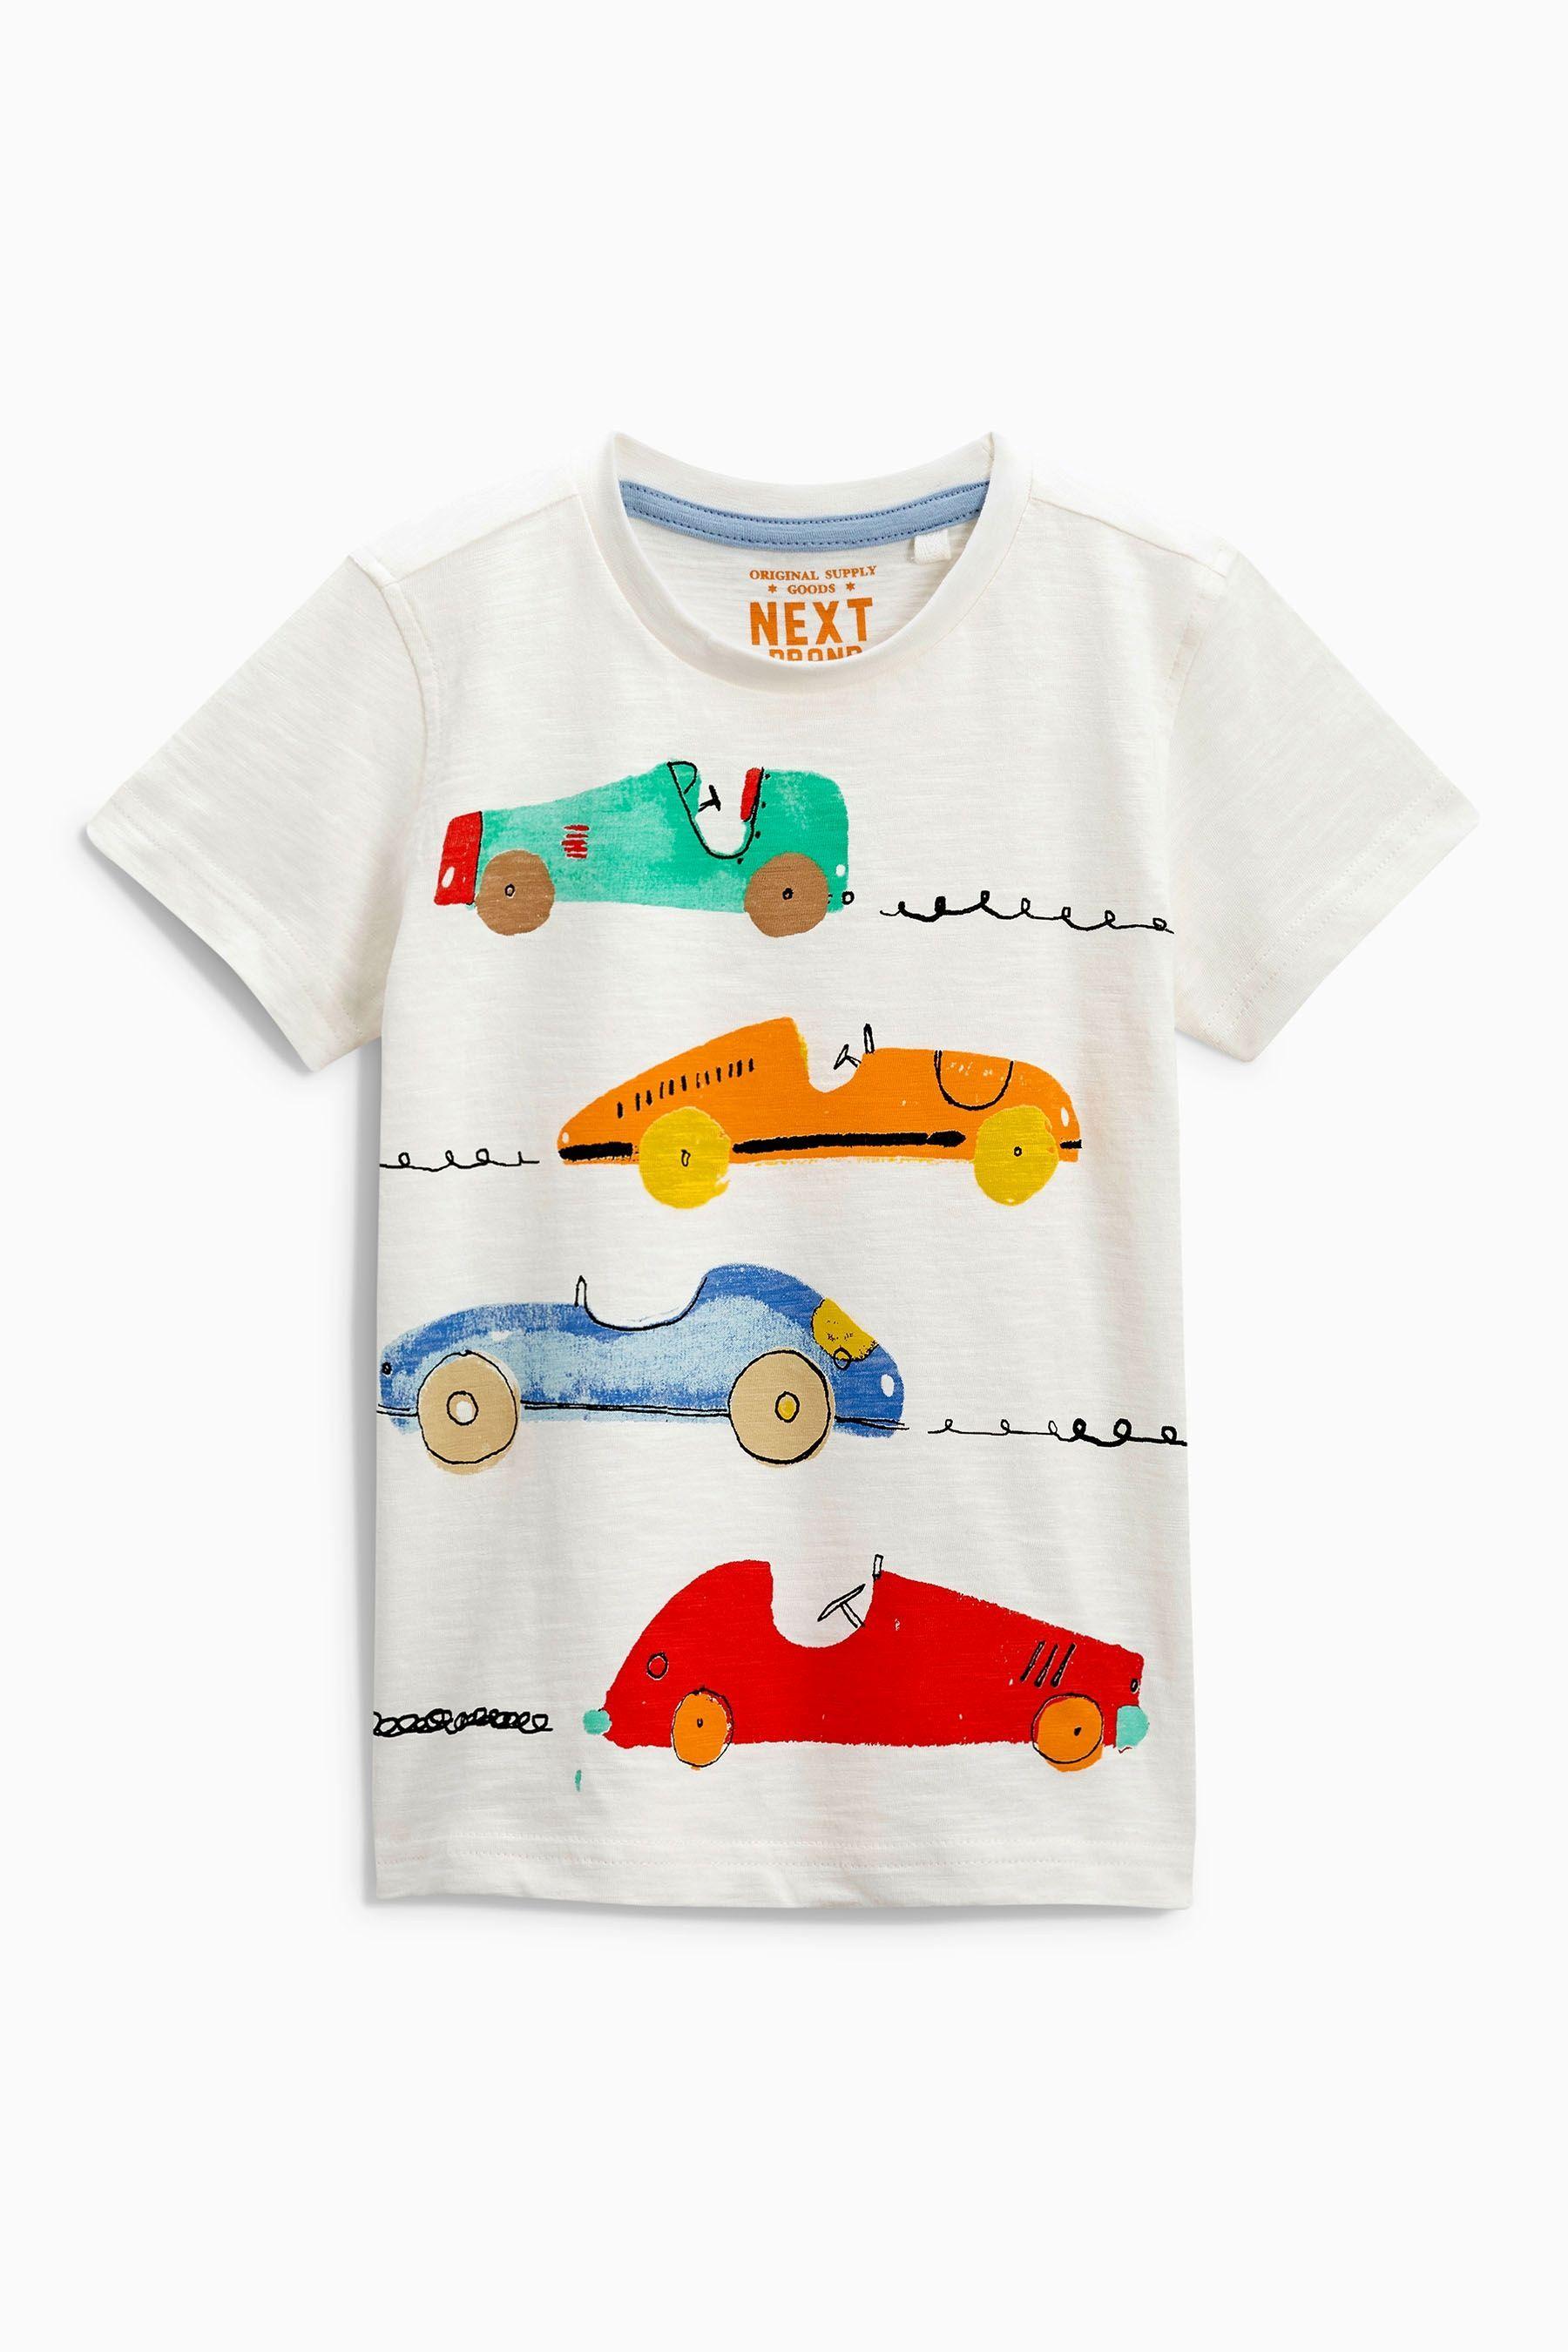 Cheap T Shirt Printing Online Uk